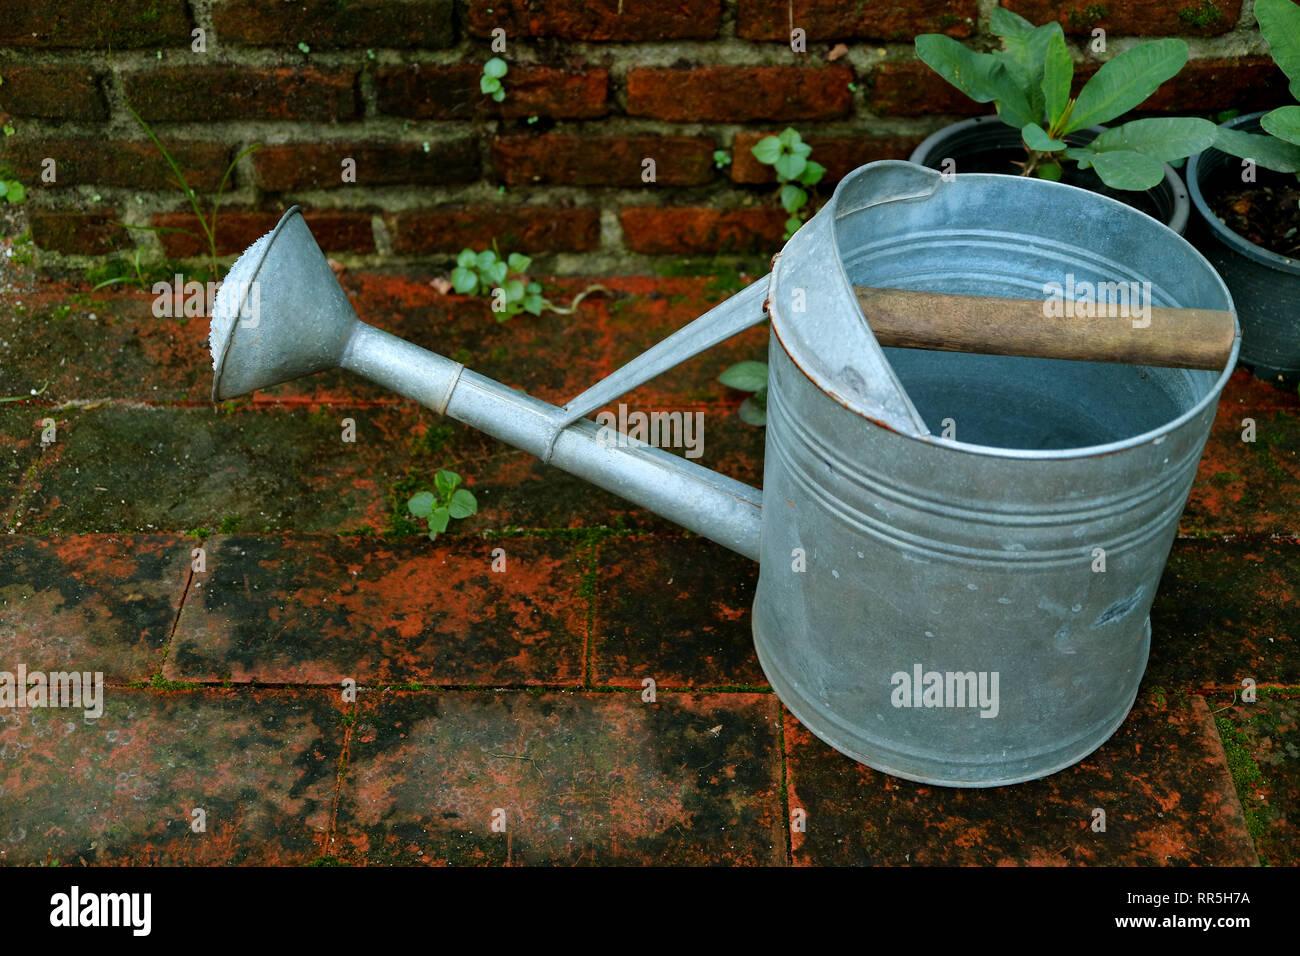 One galvanized watering can on the garden's brick floor - Stock Image